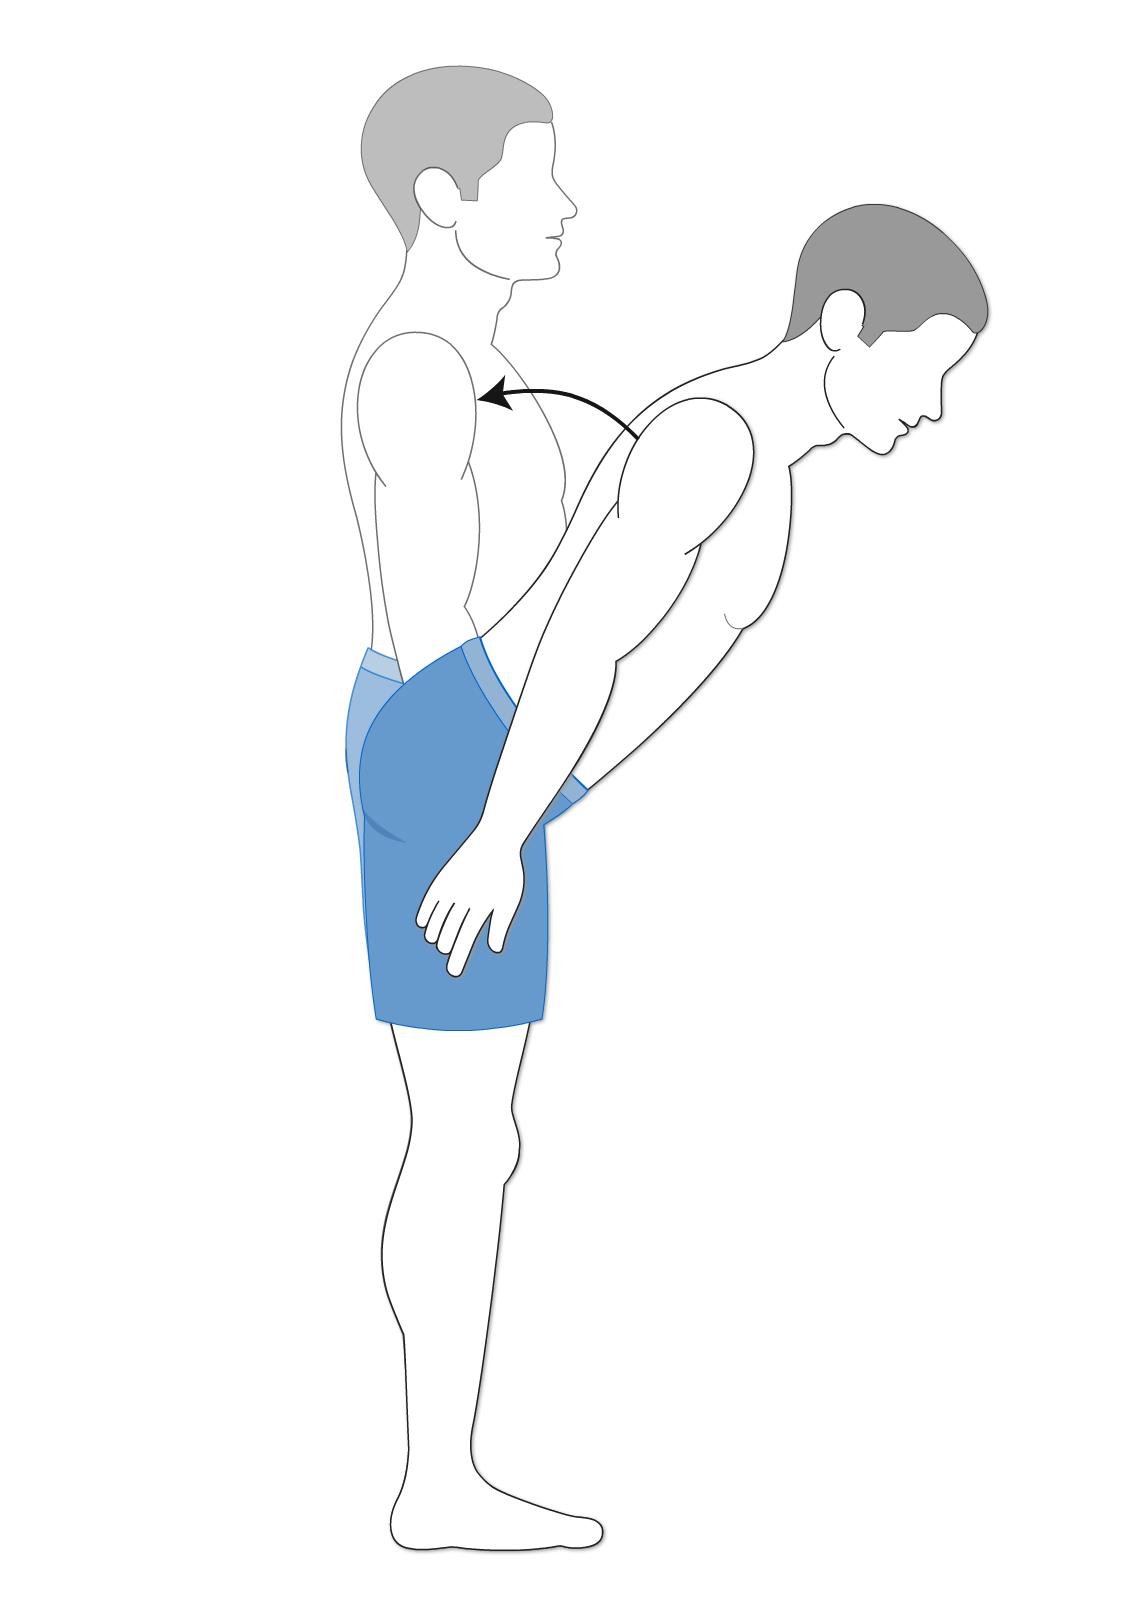 Flexion of the vertebral column